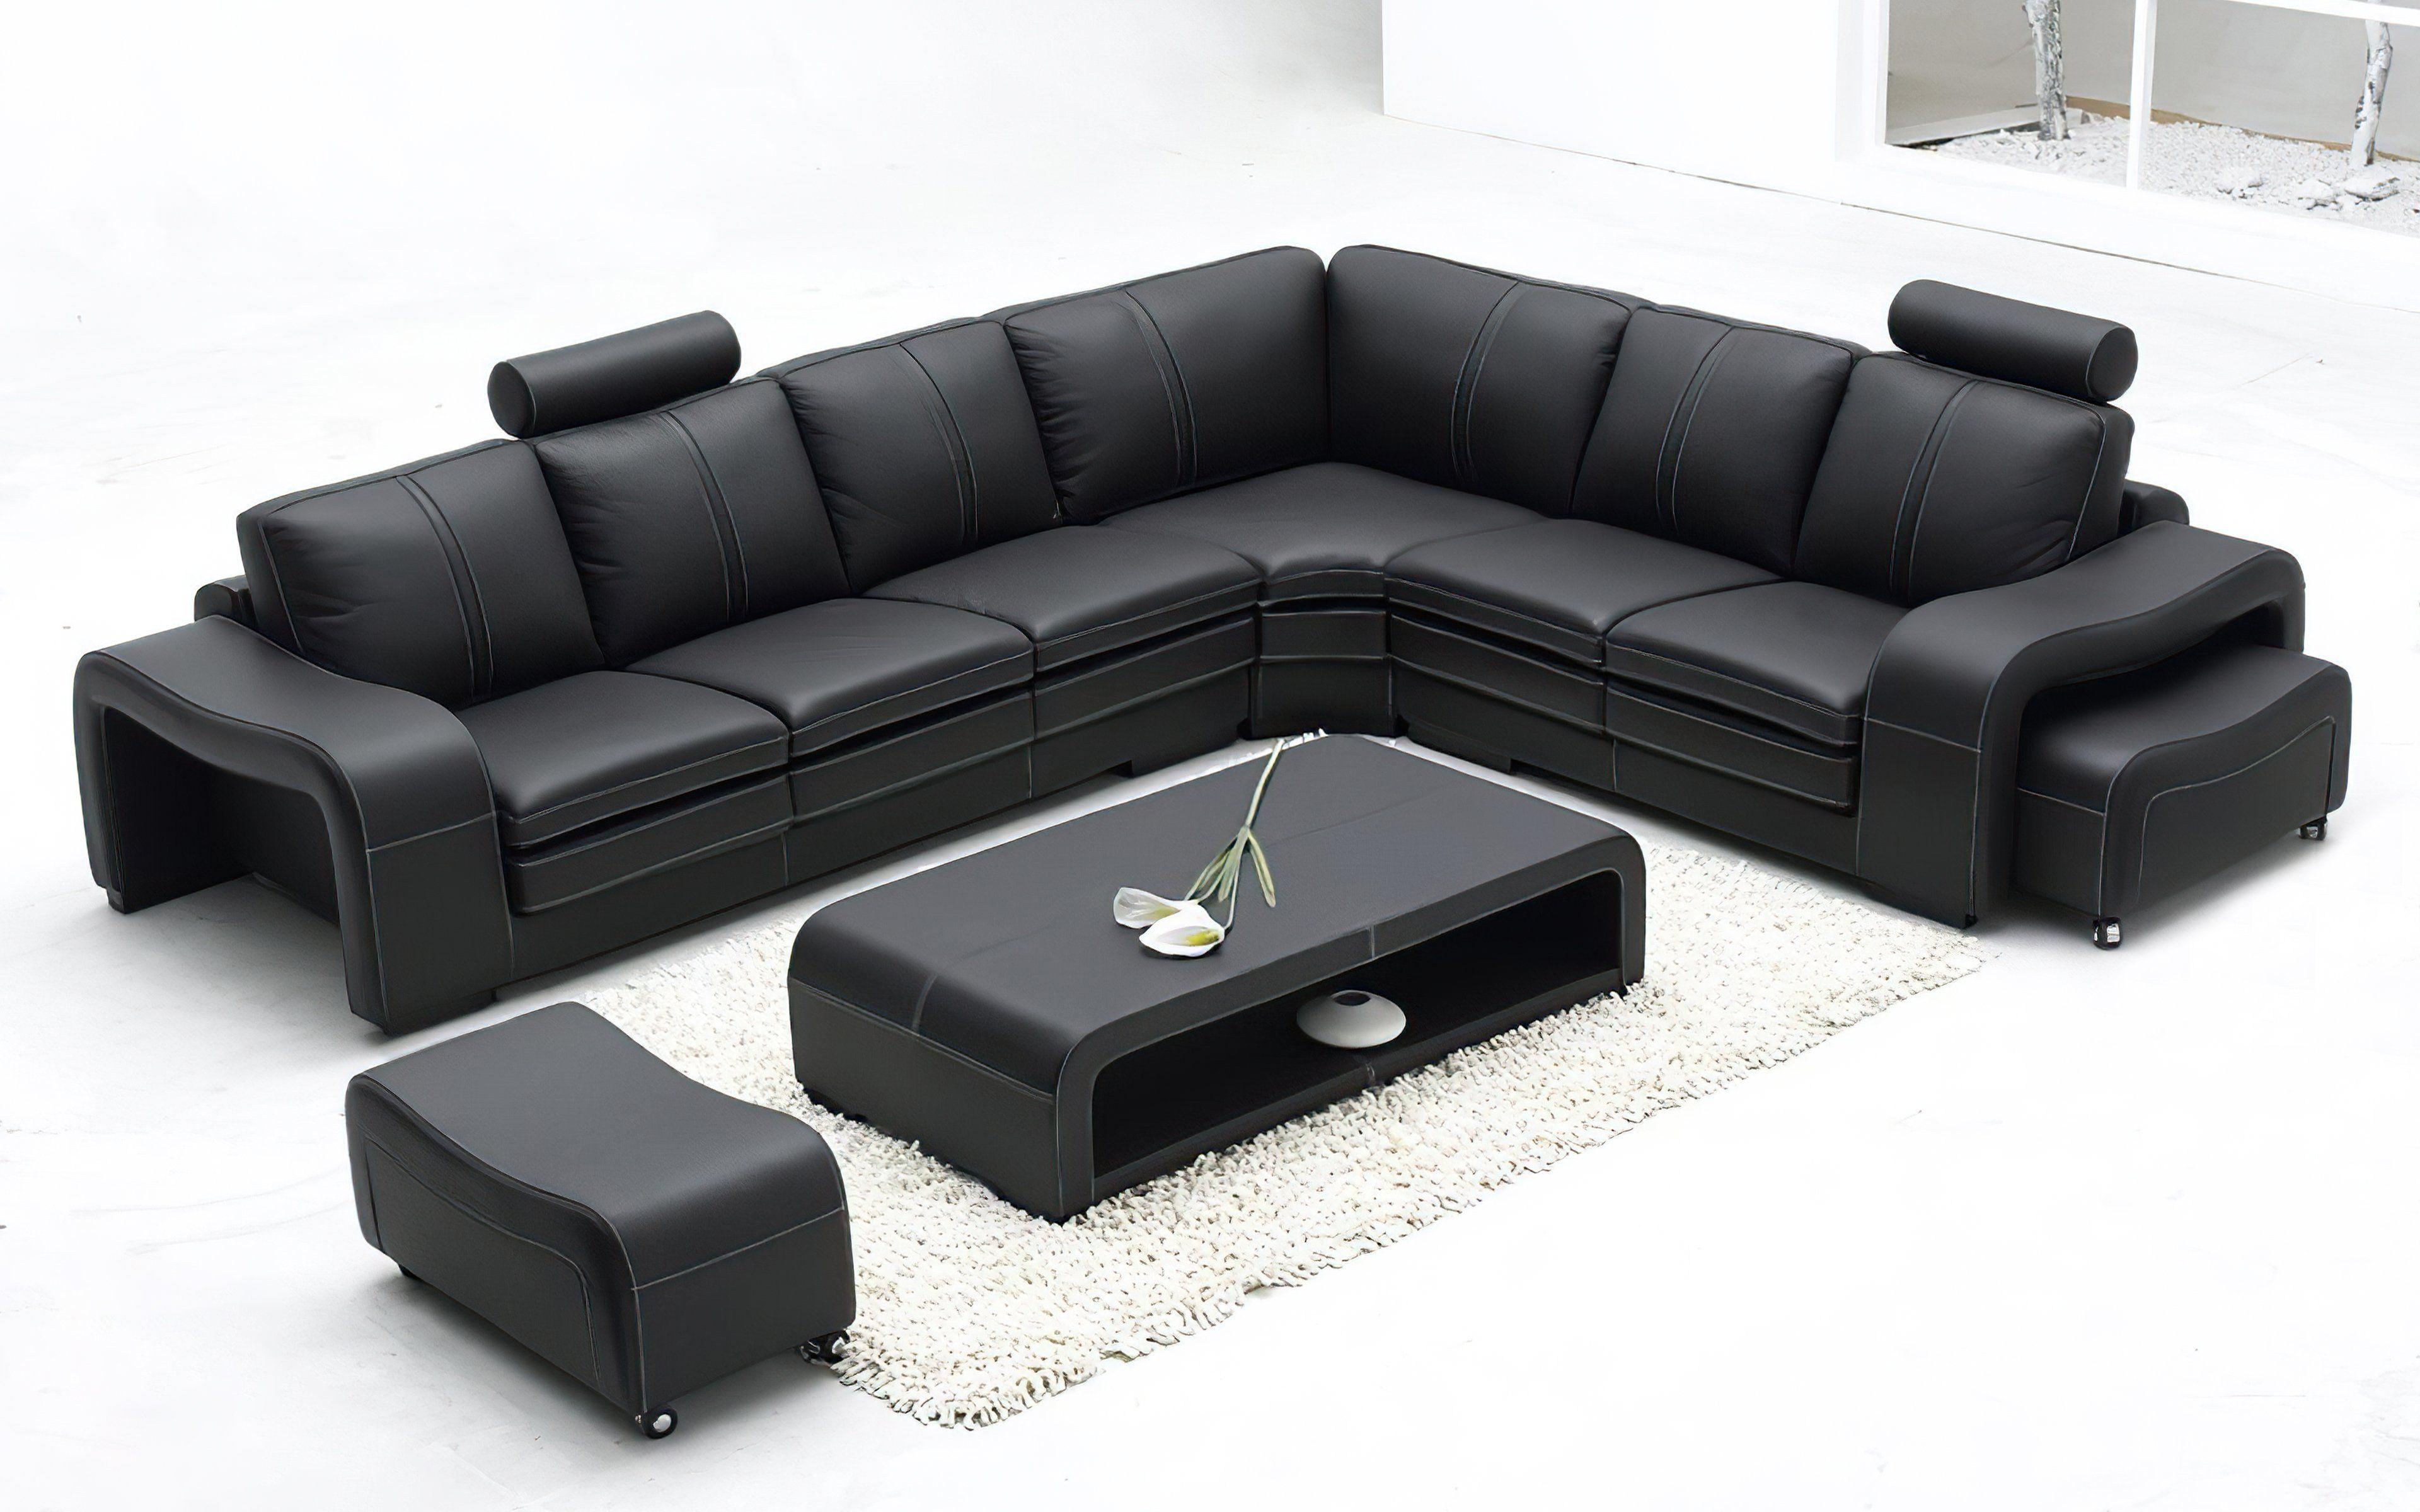 Aithen Modern Leather Sectional In 2021 Leather Sofa Set Leather Corner Sofa Black Modern Sofa